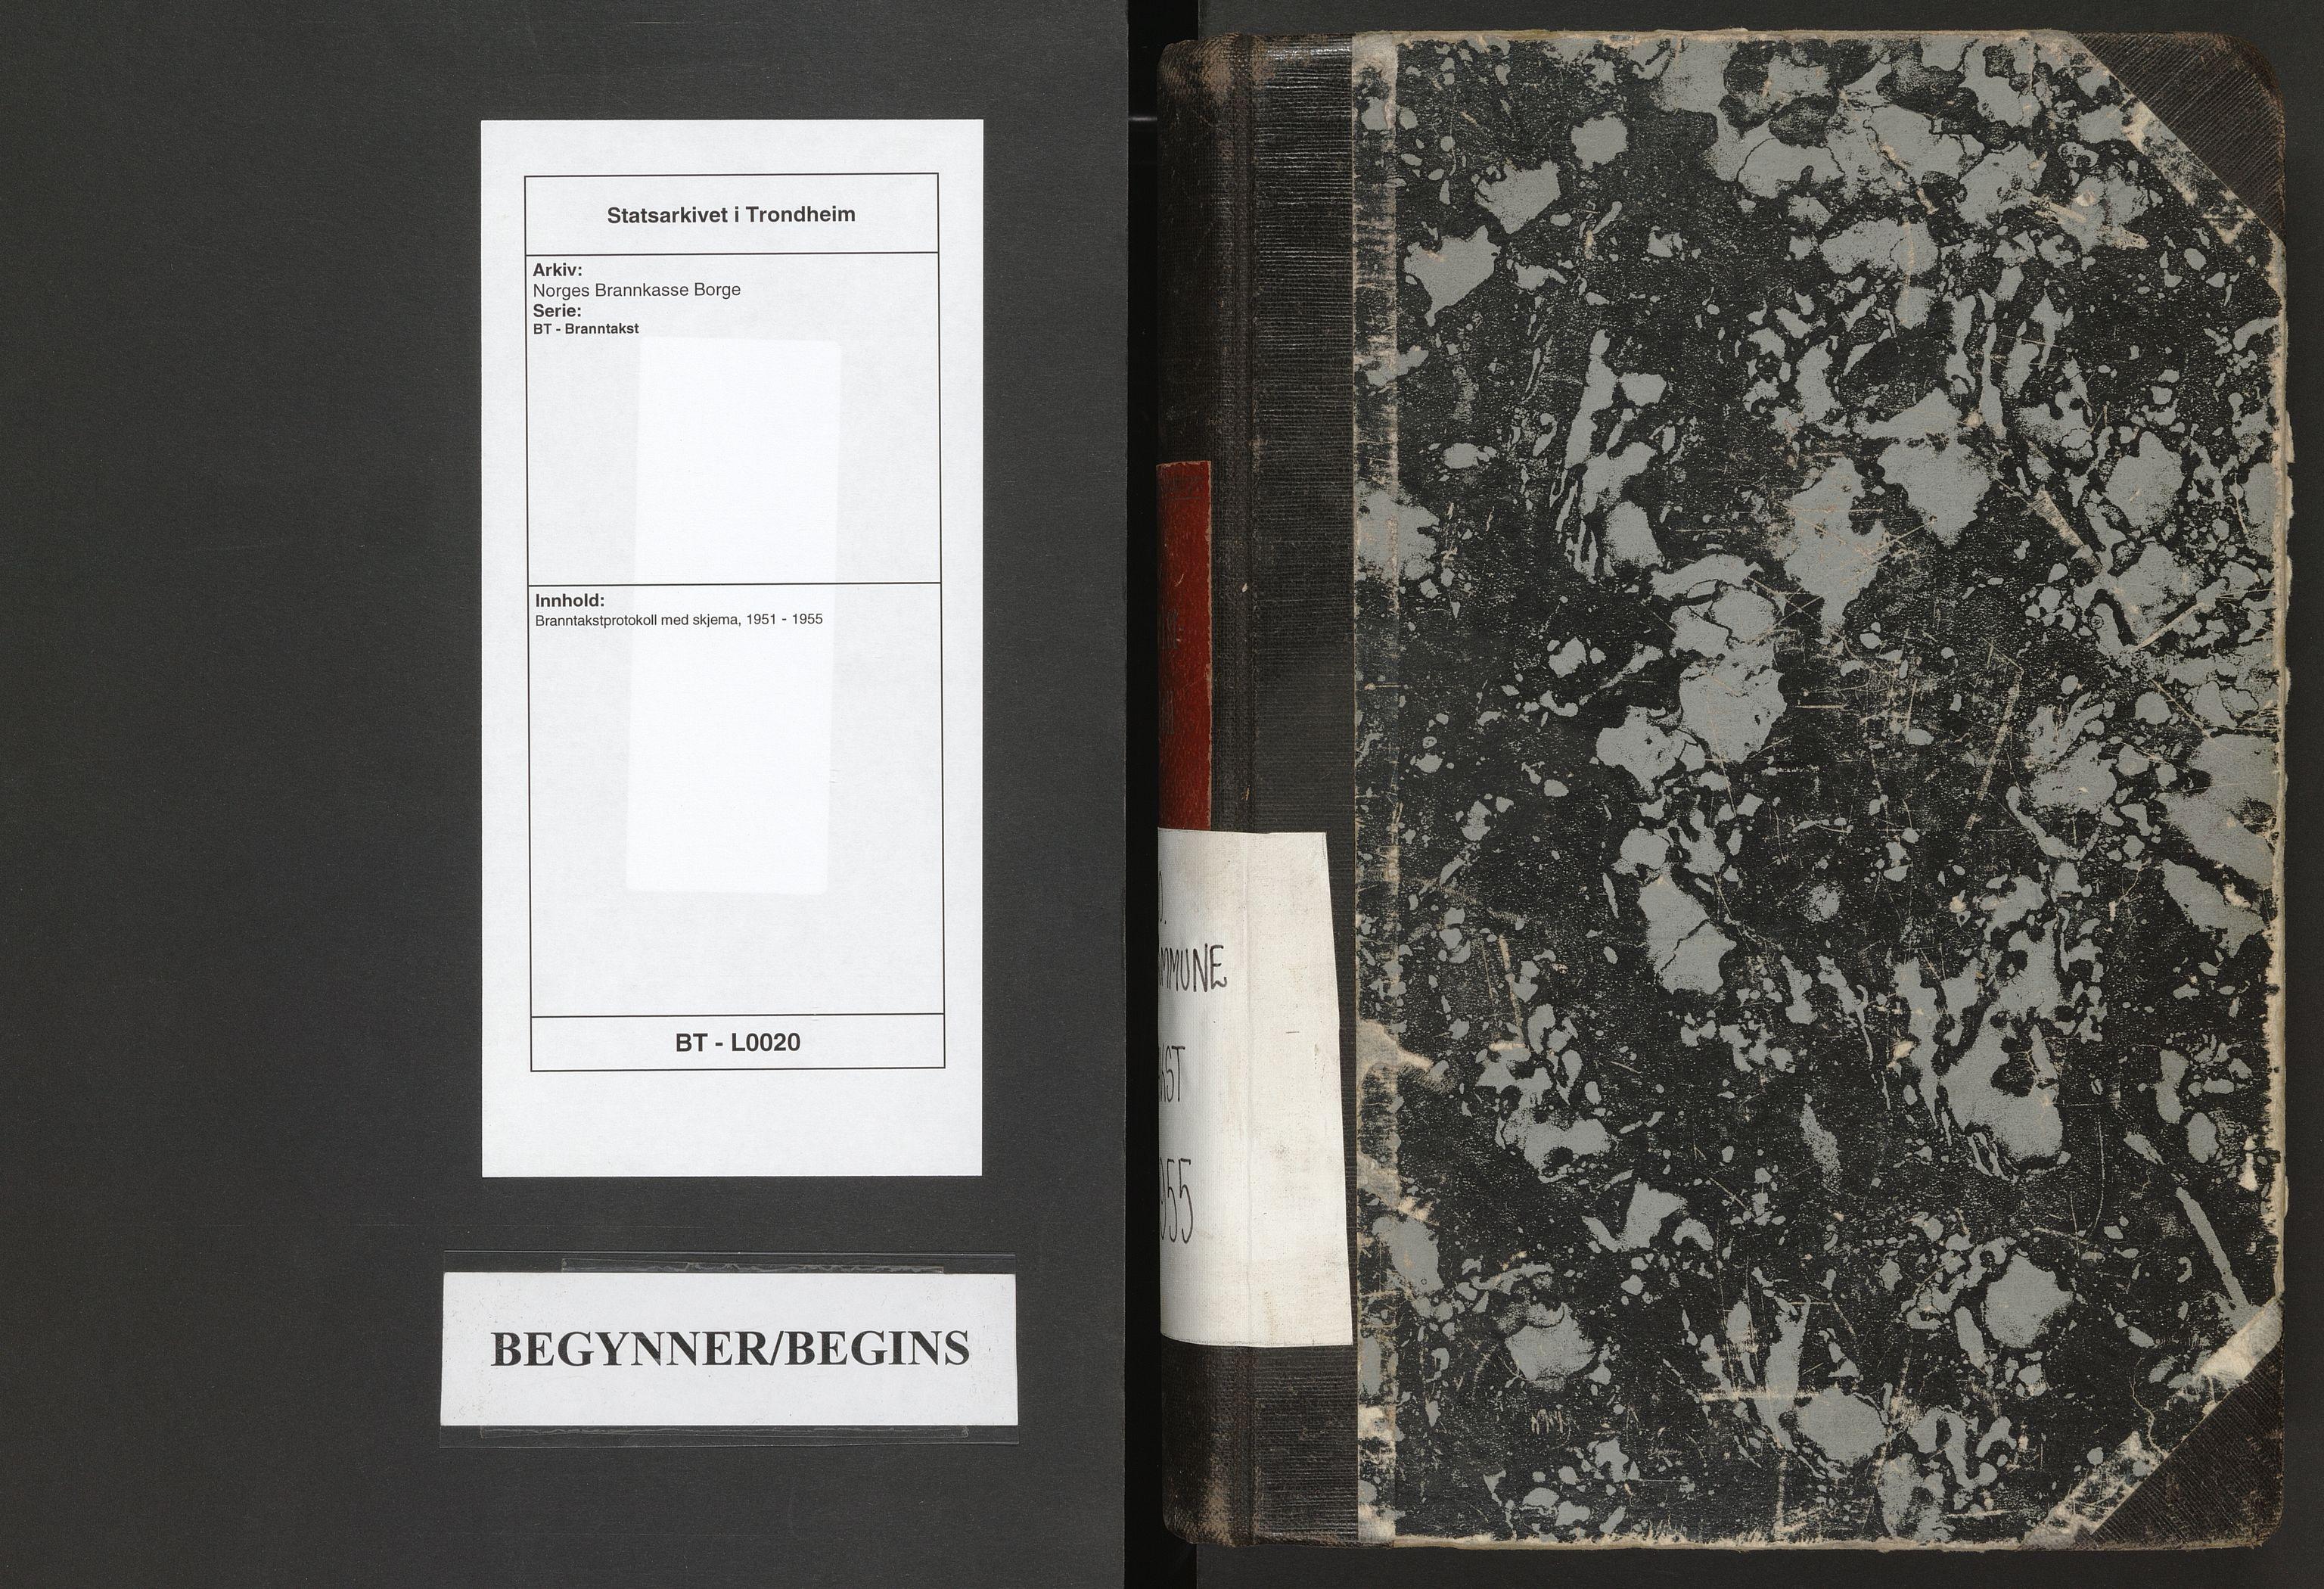 SAT, Norges Brannkasse Borge, BT/L0020: Branntakstprotokoll med skjema, 1951-1955